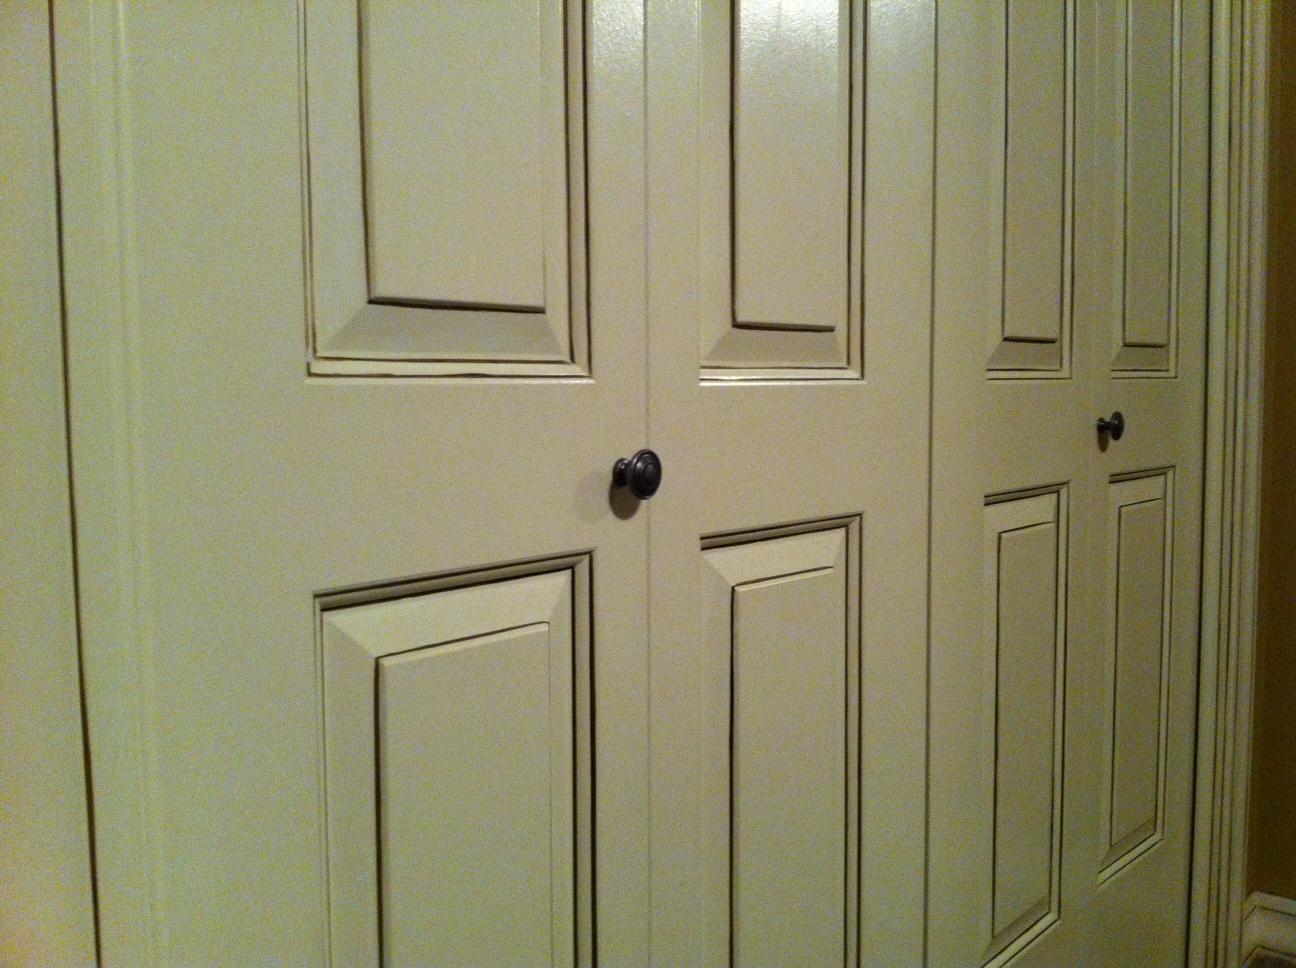 decorative closet door knobs photo - 9